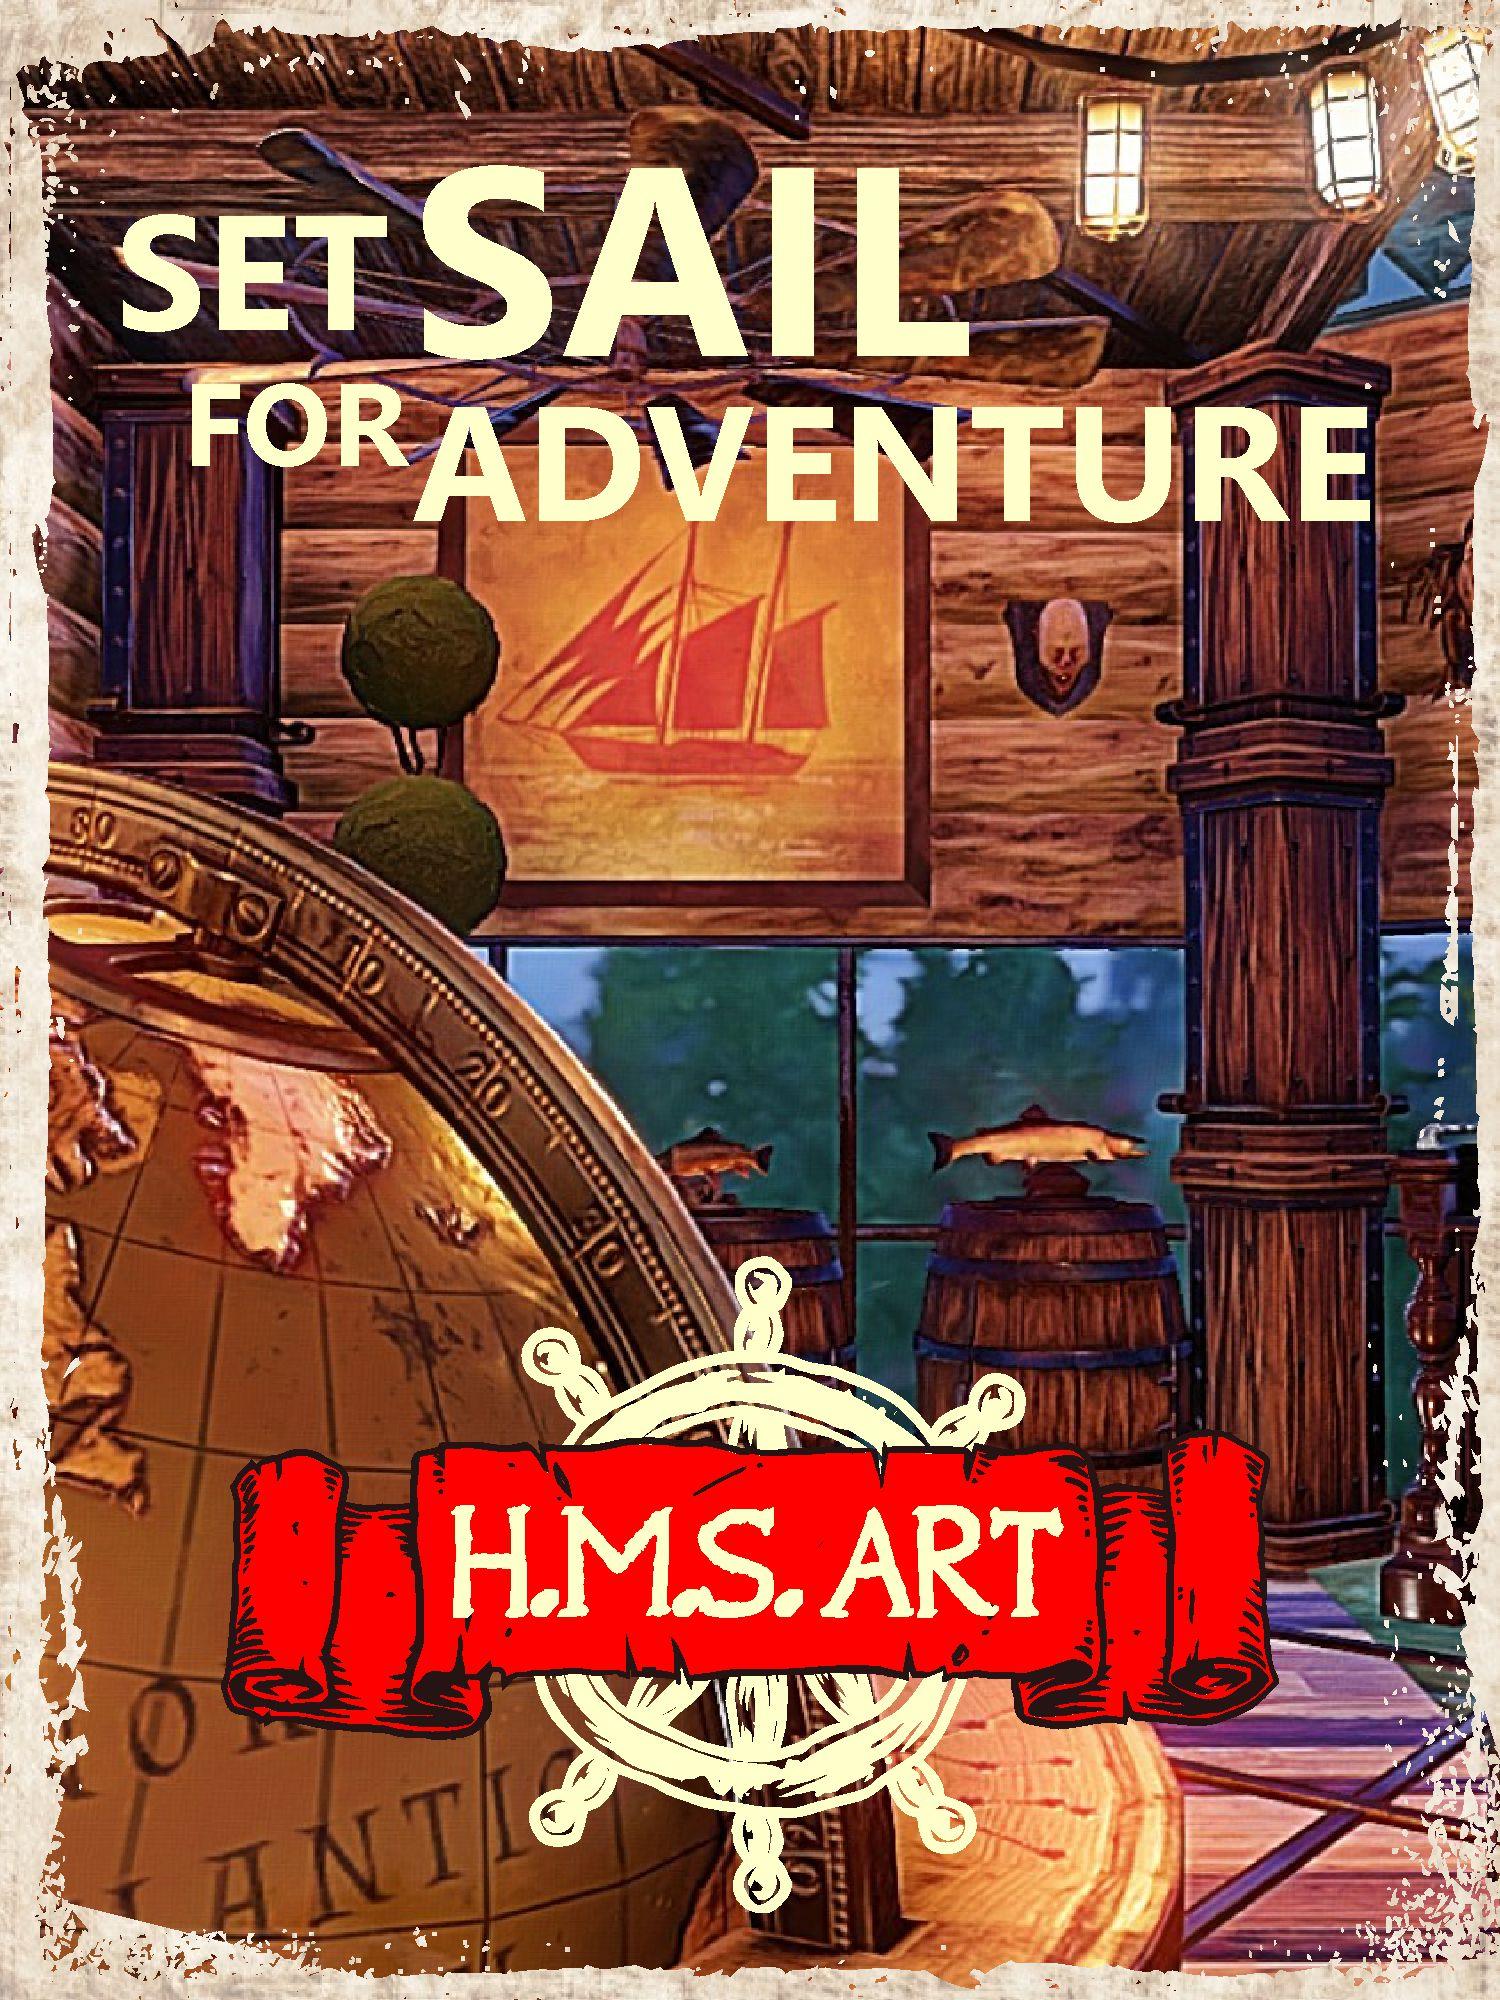 HMS ART